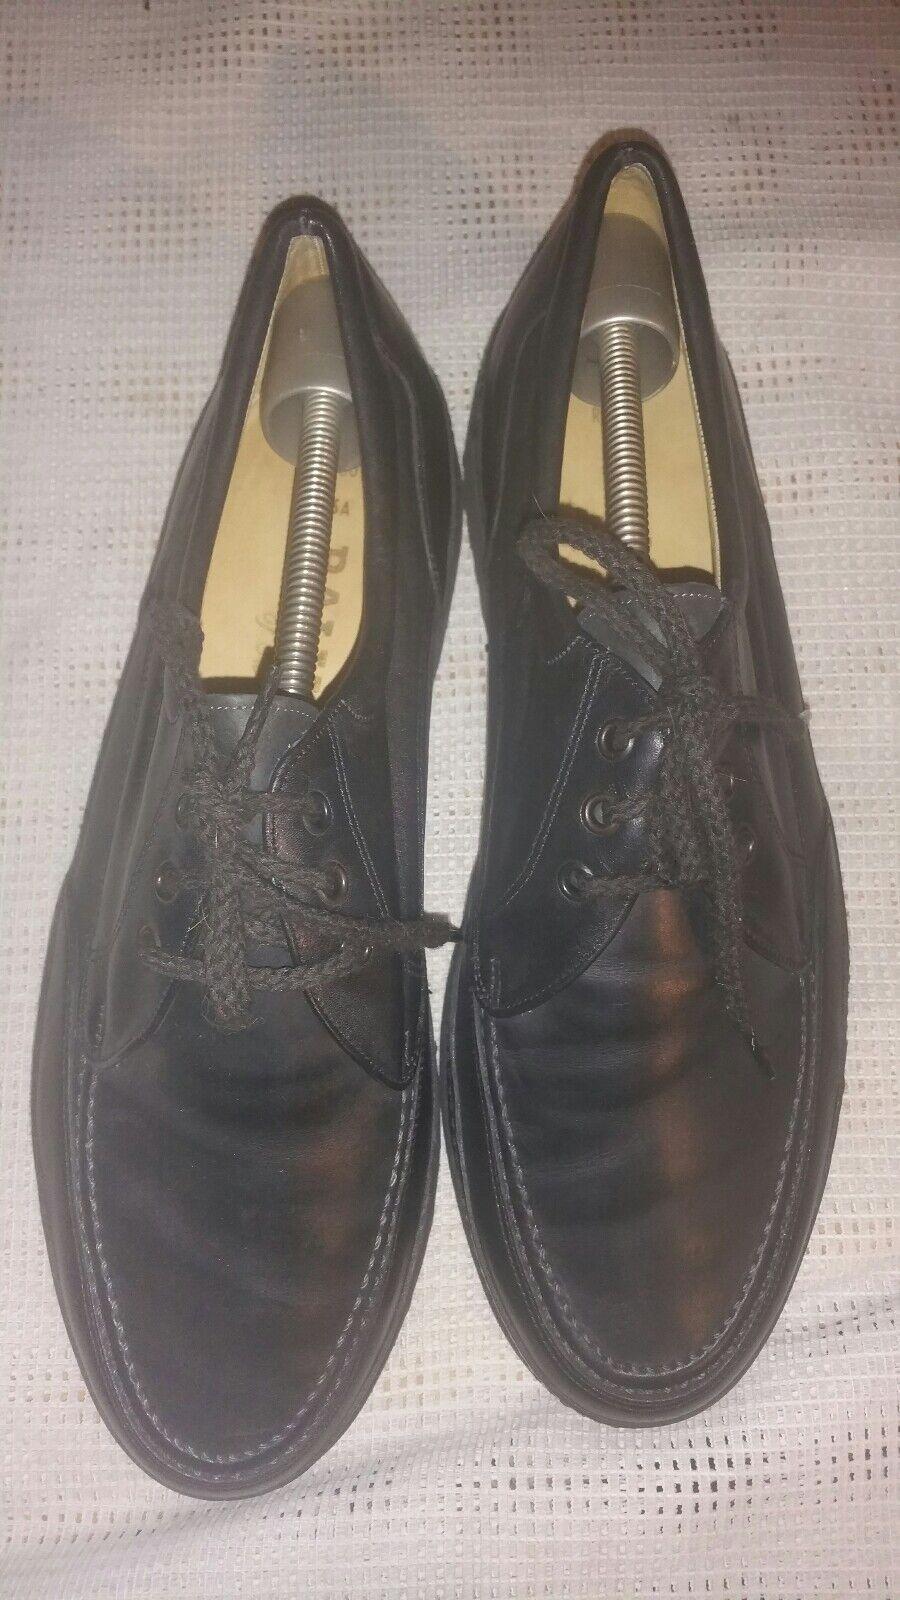 Bally Herren Schuhe Business Lederschuhe in Schwarz  Gr.42 E UK 8